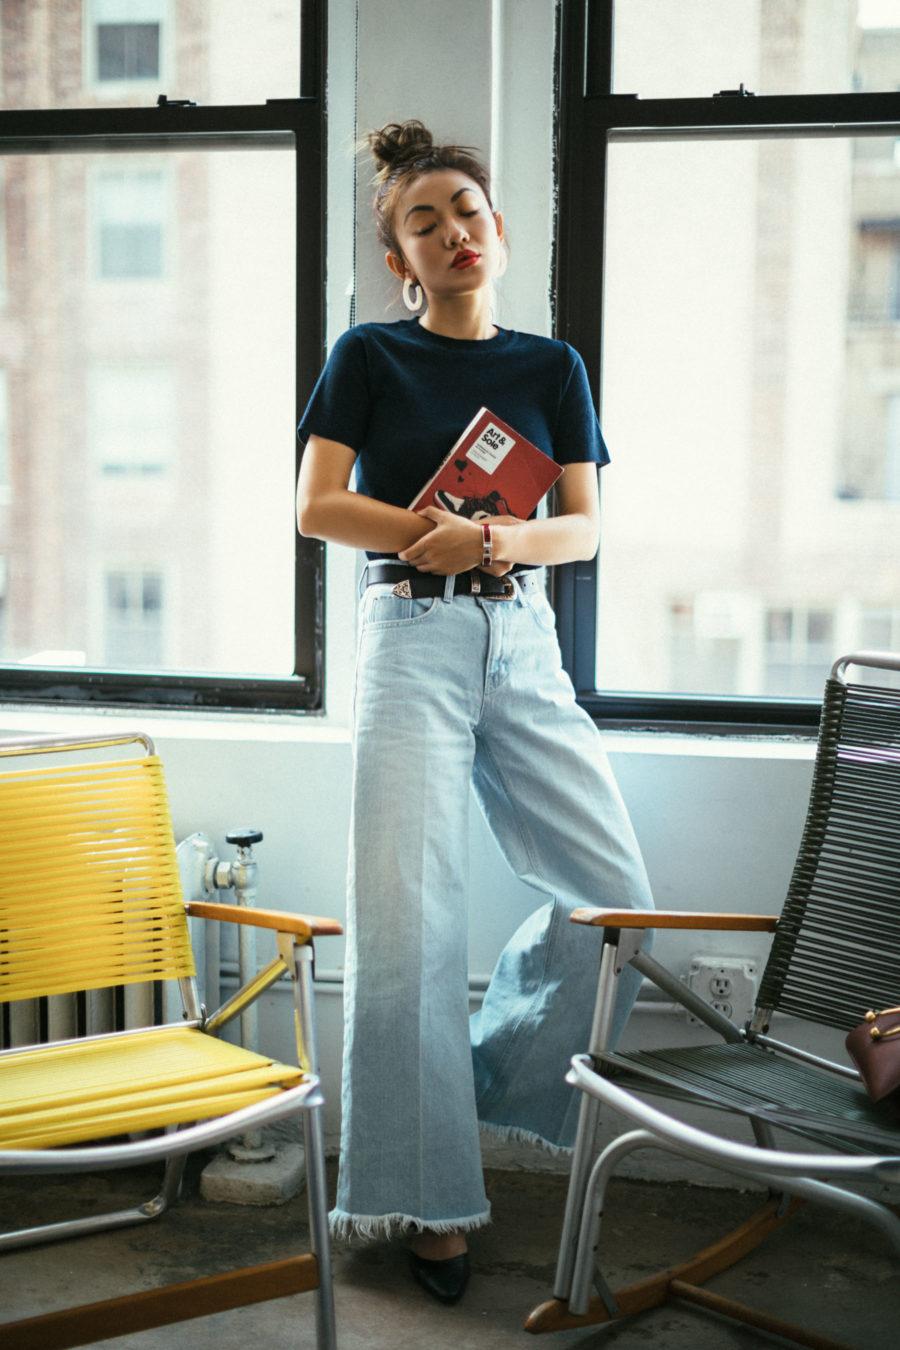 Wide Leg Denim Pants Style For Fall // NotJessFashion.com